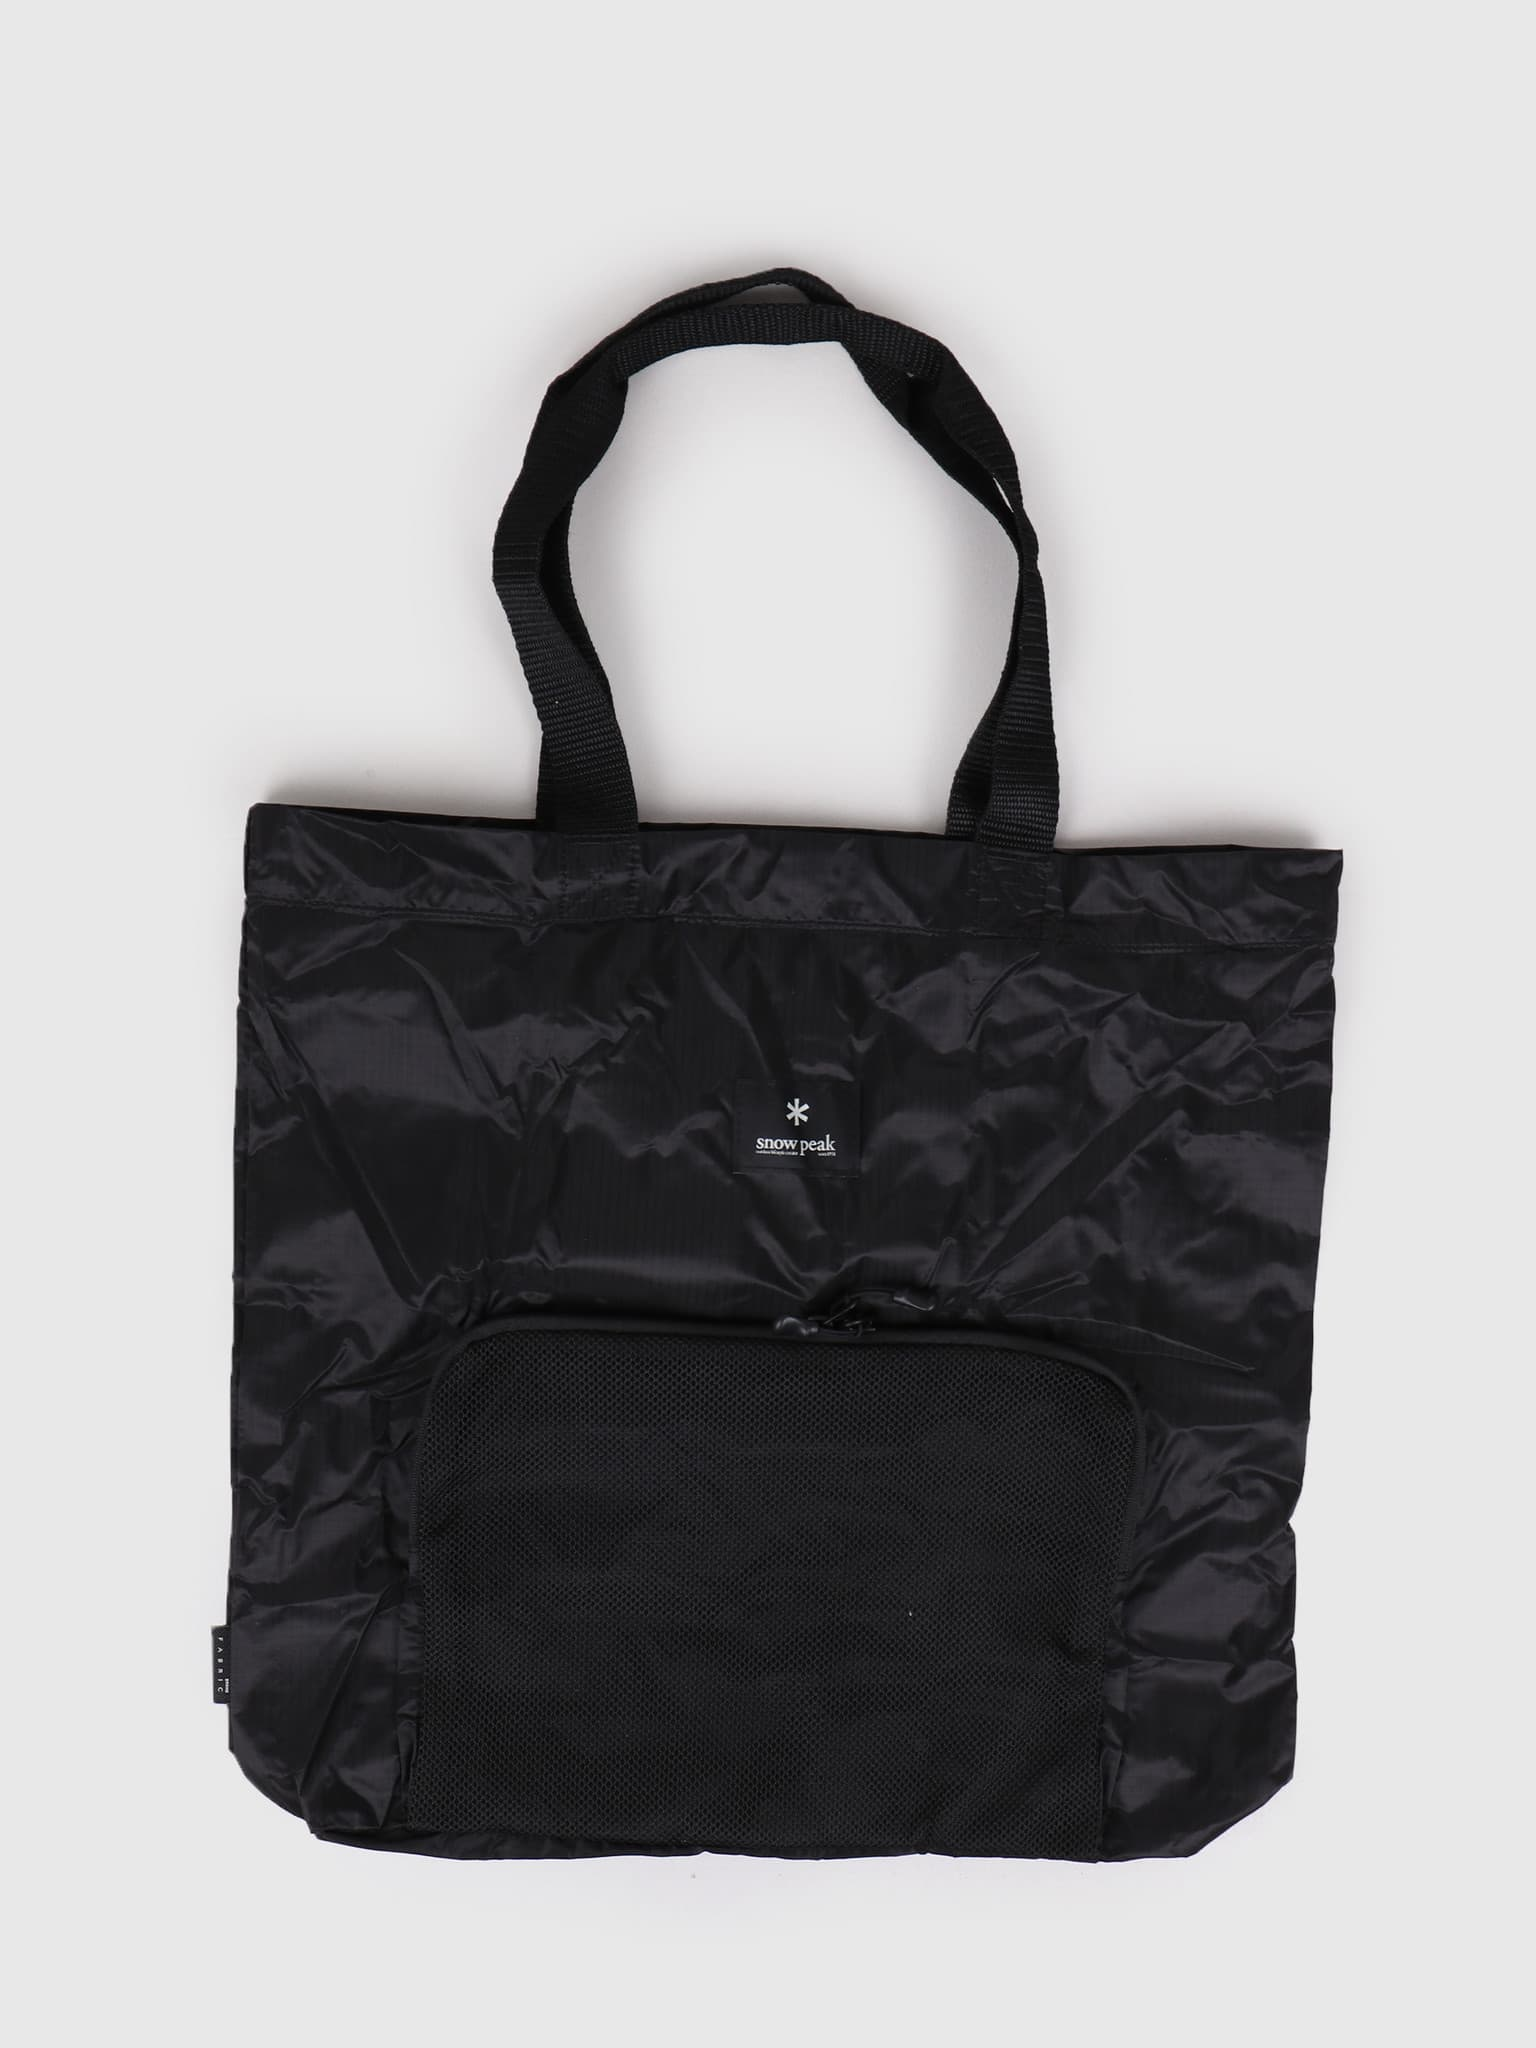 Pocketable Tote Bag Type 01 One Black UG-62400BK